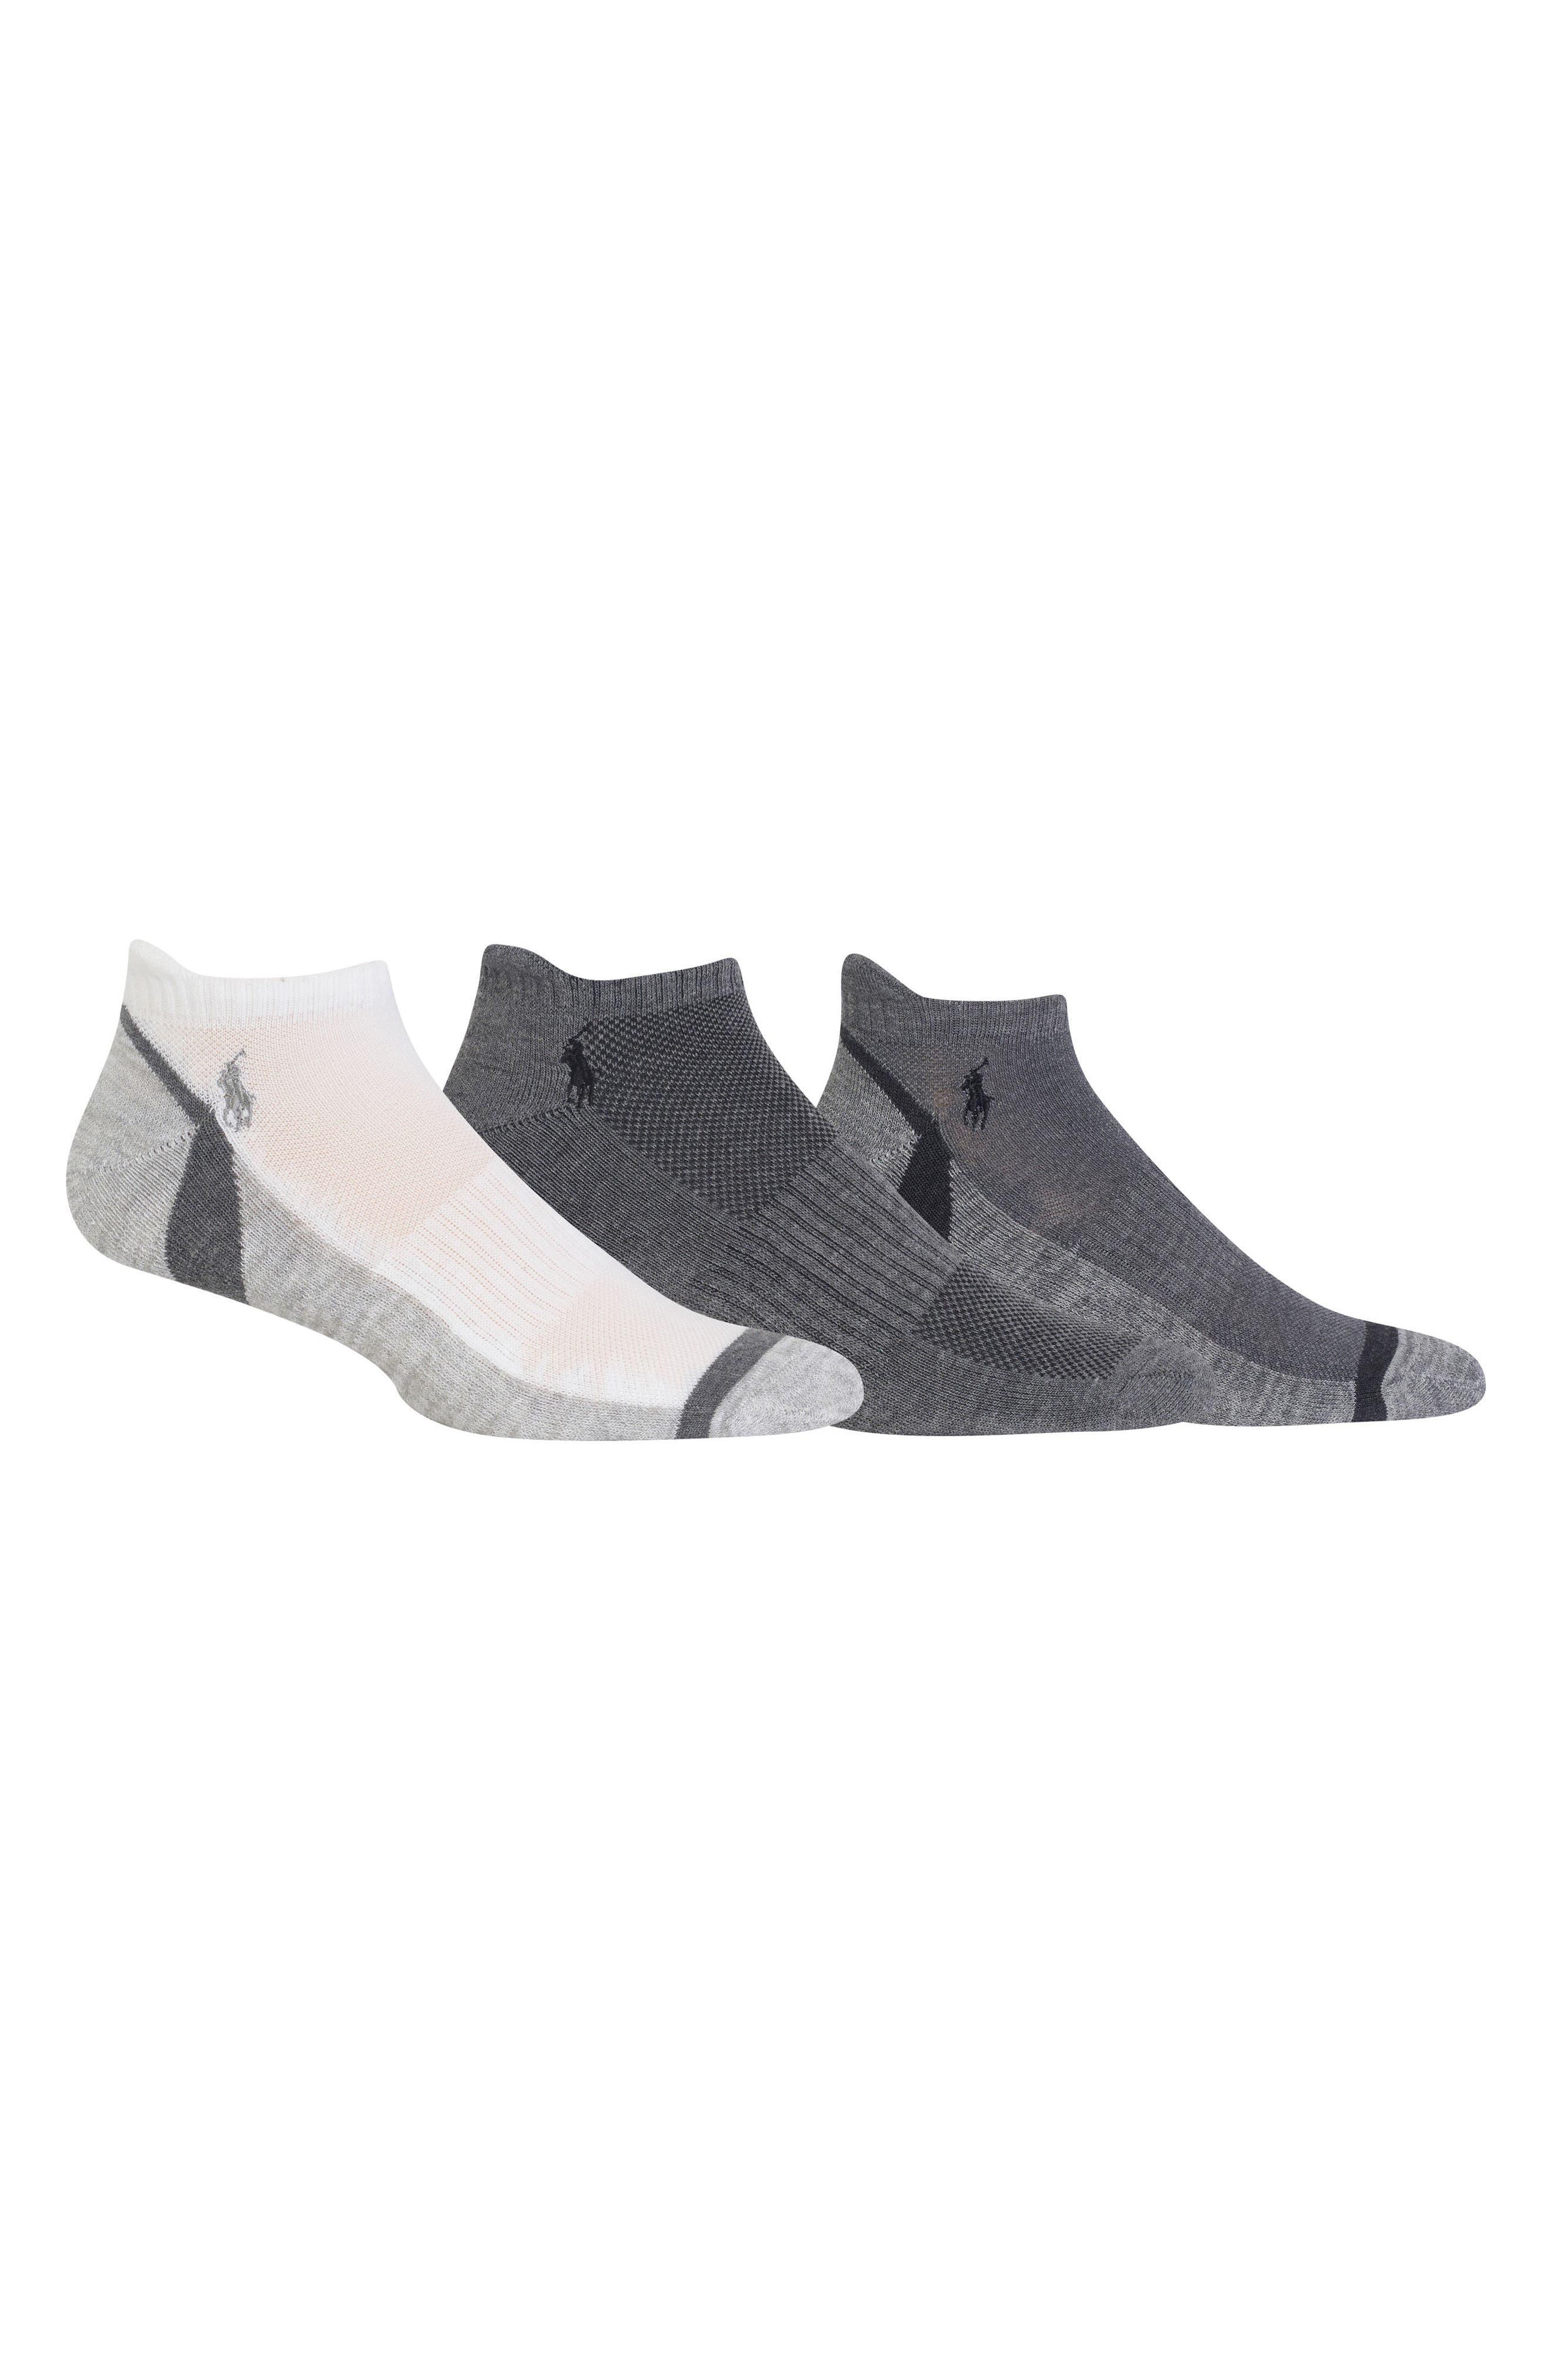 Polo Ralph Lauren 3-Pack Ankle Socks,                             Main thumbnail 1, color,                             050